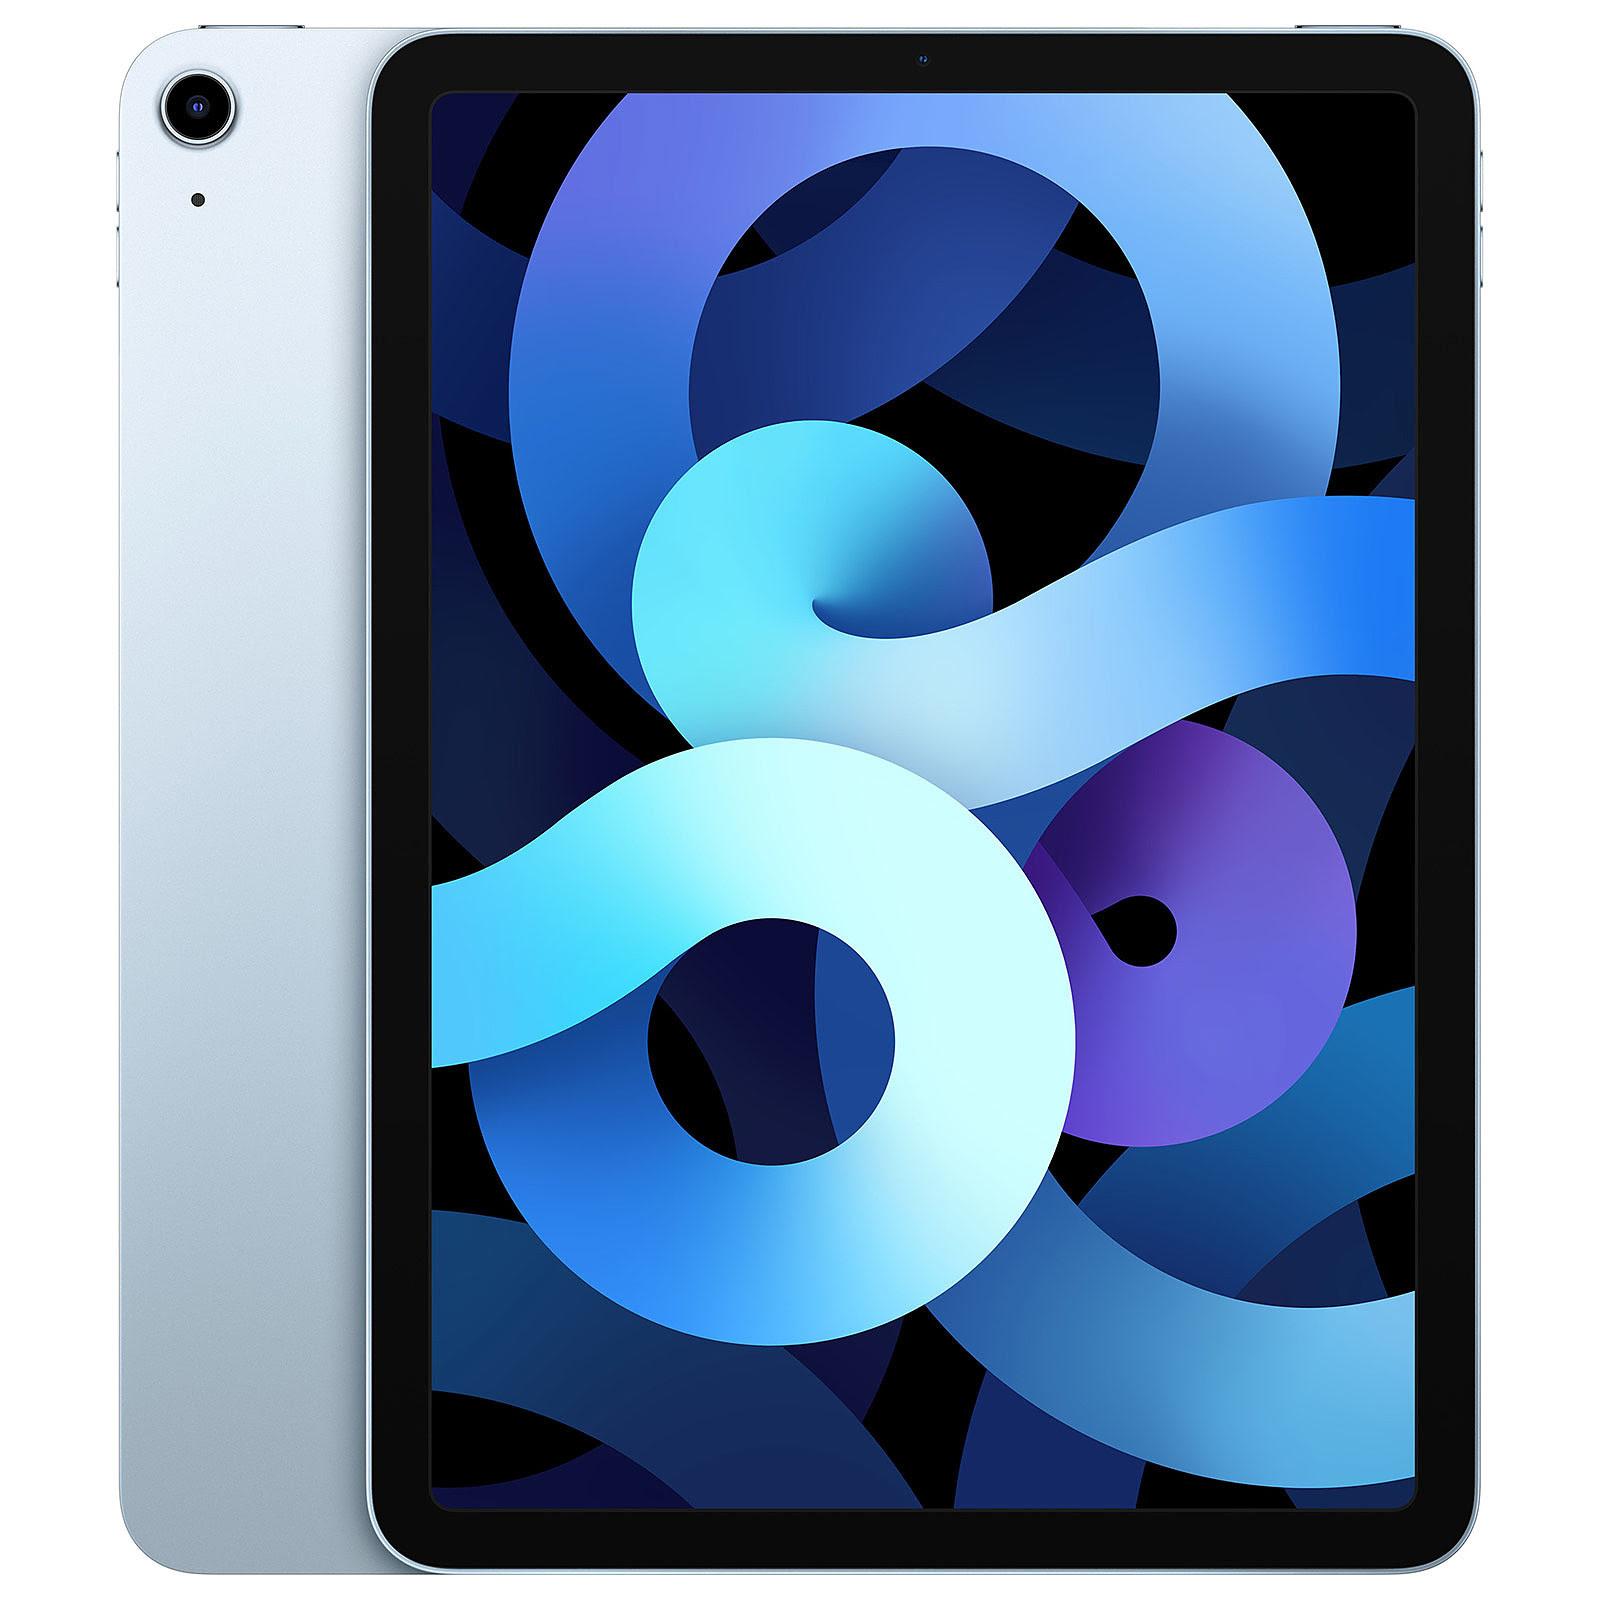 "Apple iPad Air 10.9"" WiFi 64Go Bleu Ciel - Tablette tactile Apple - 0"